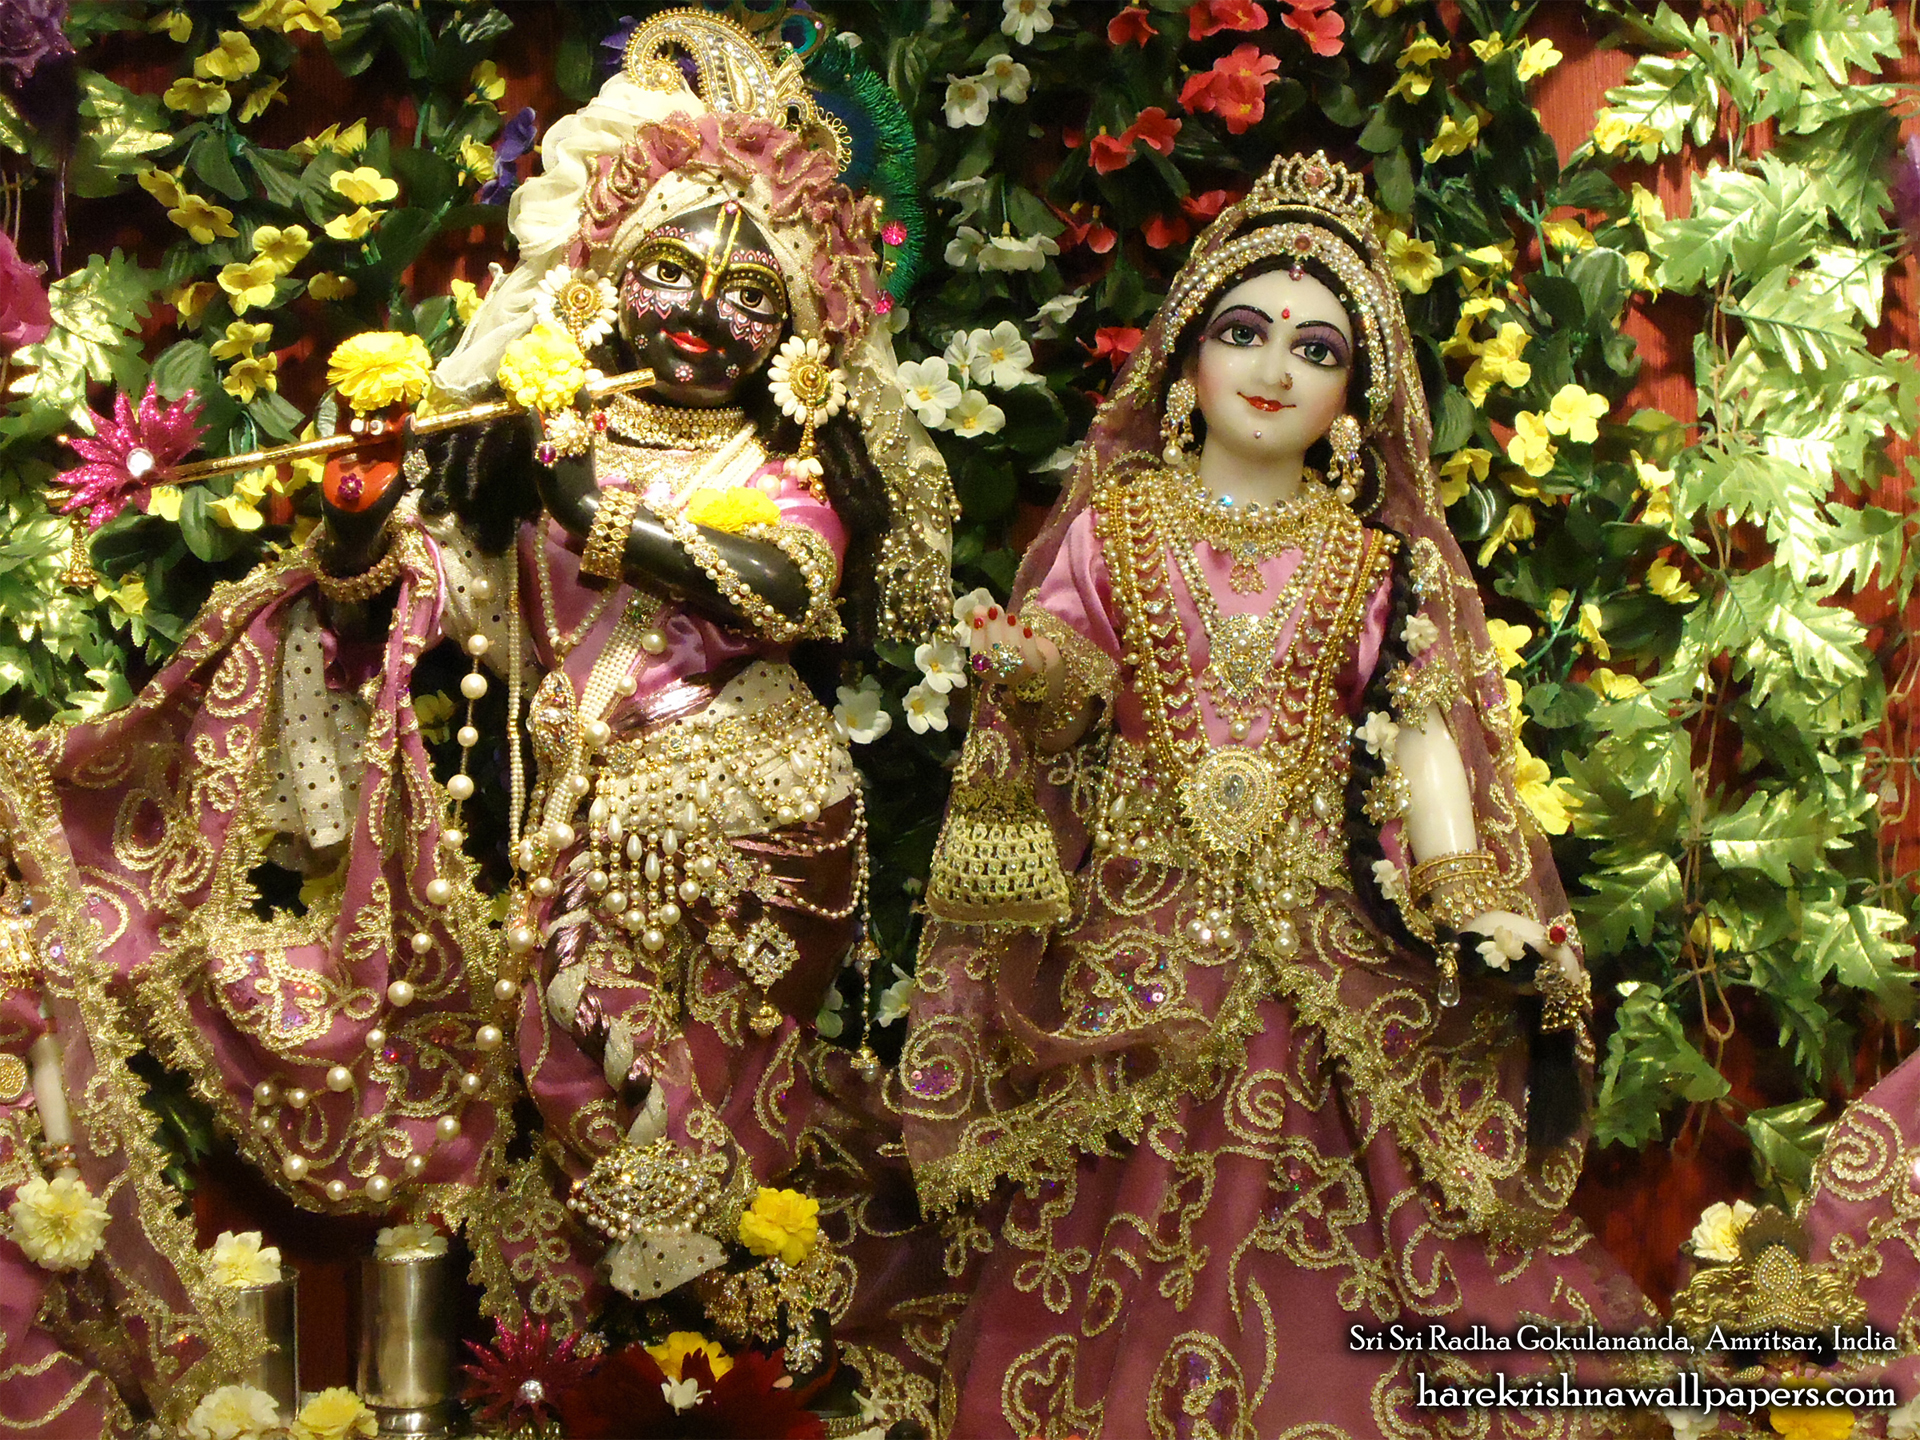 Sri Sri Radha Gokulananda Wallpaper (003) Size 1920x1440 Download